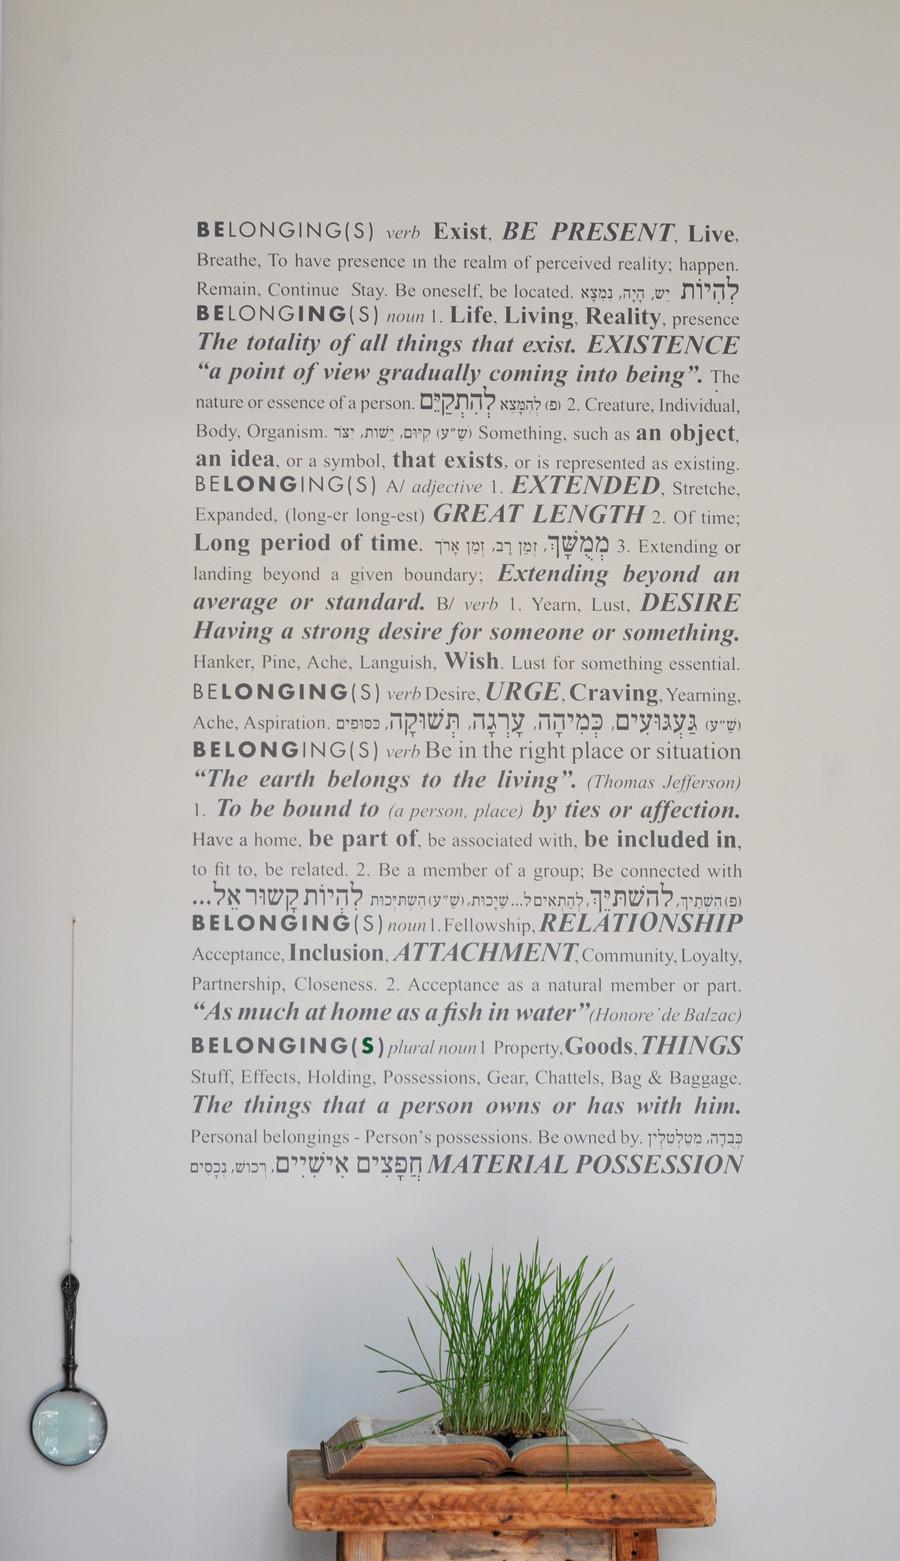 belonging בילונגינג של נועה בר לב אבידור קיר המניפסט בכניסה